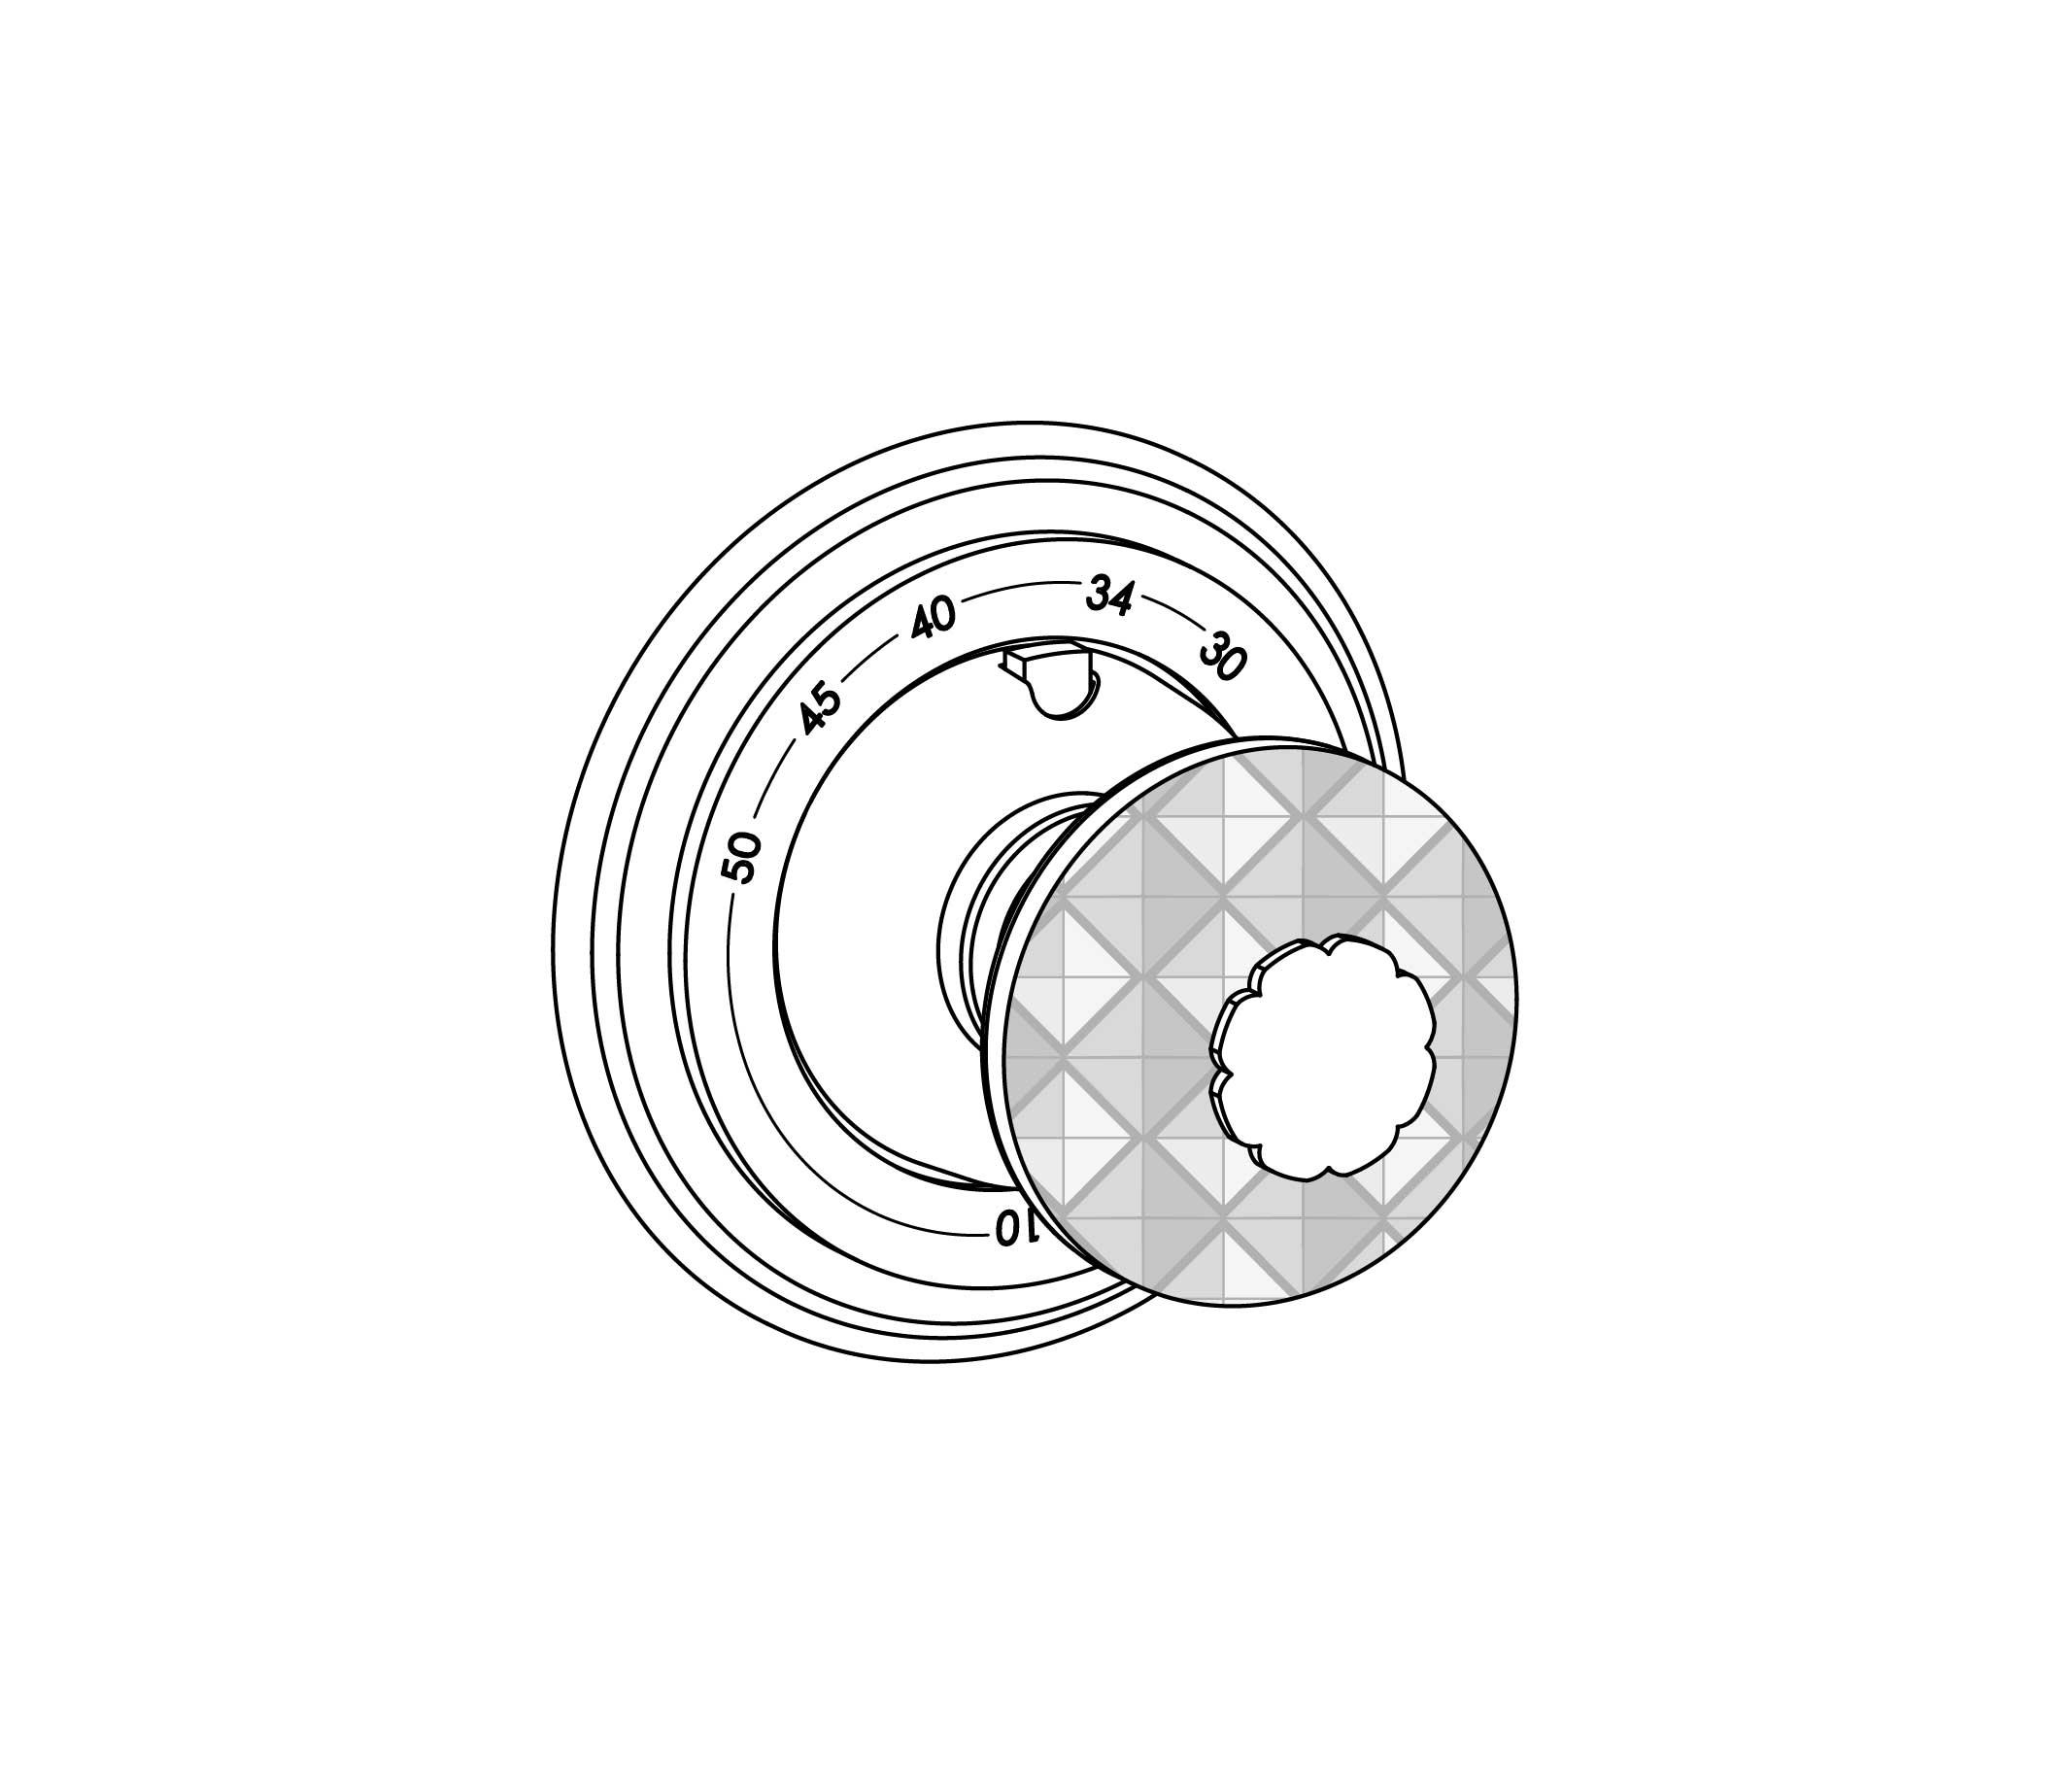 c46-4r0 plaque ronde ø80mm